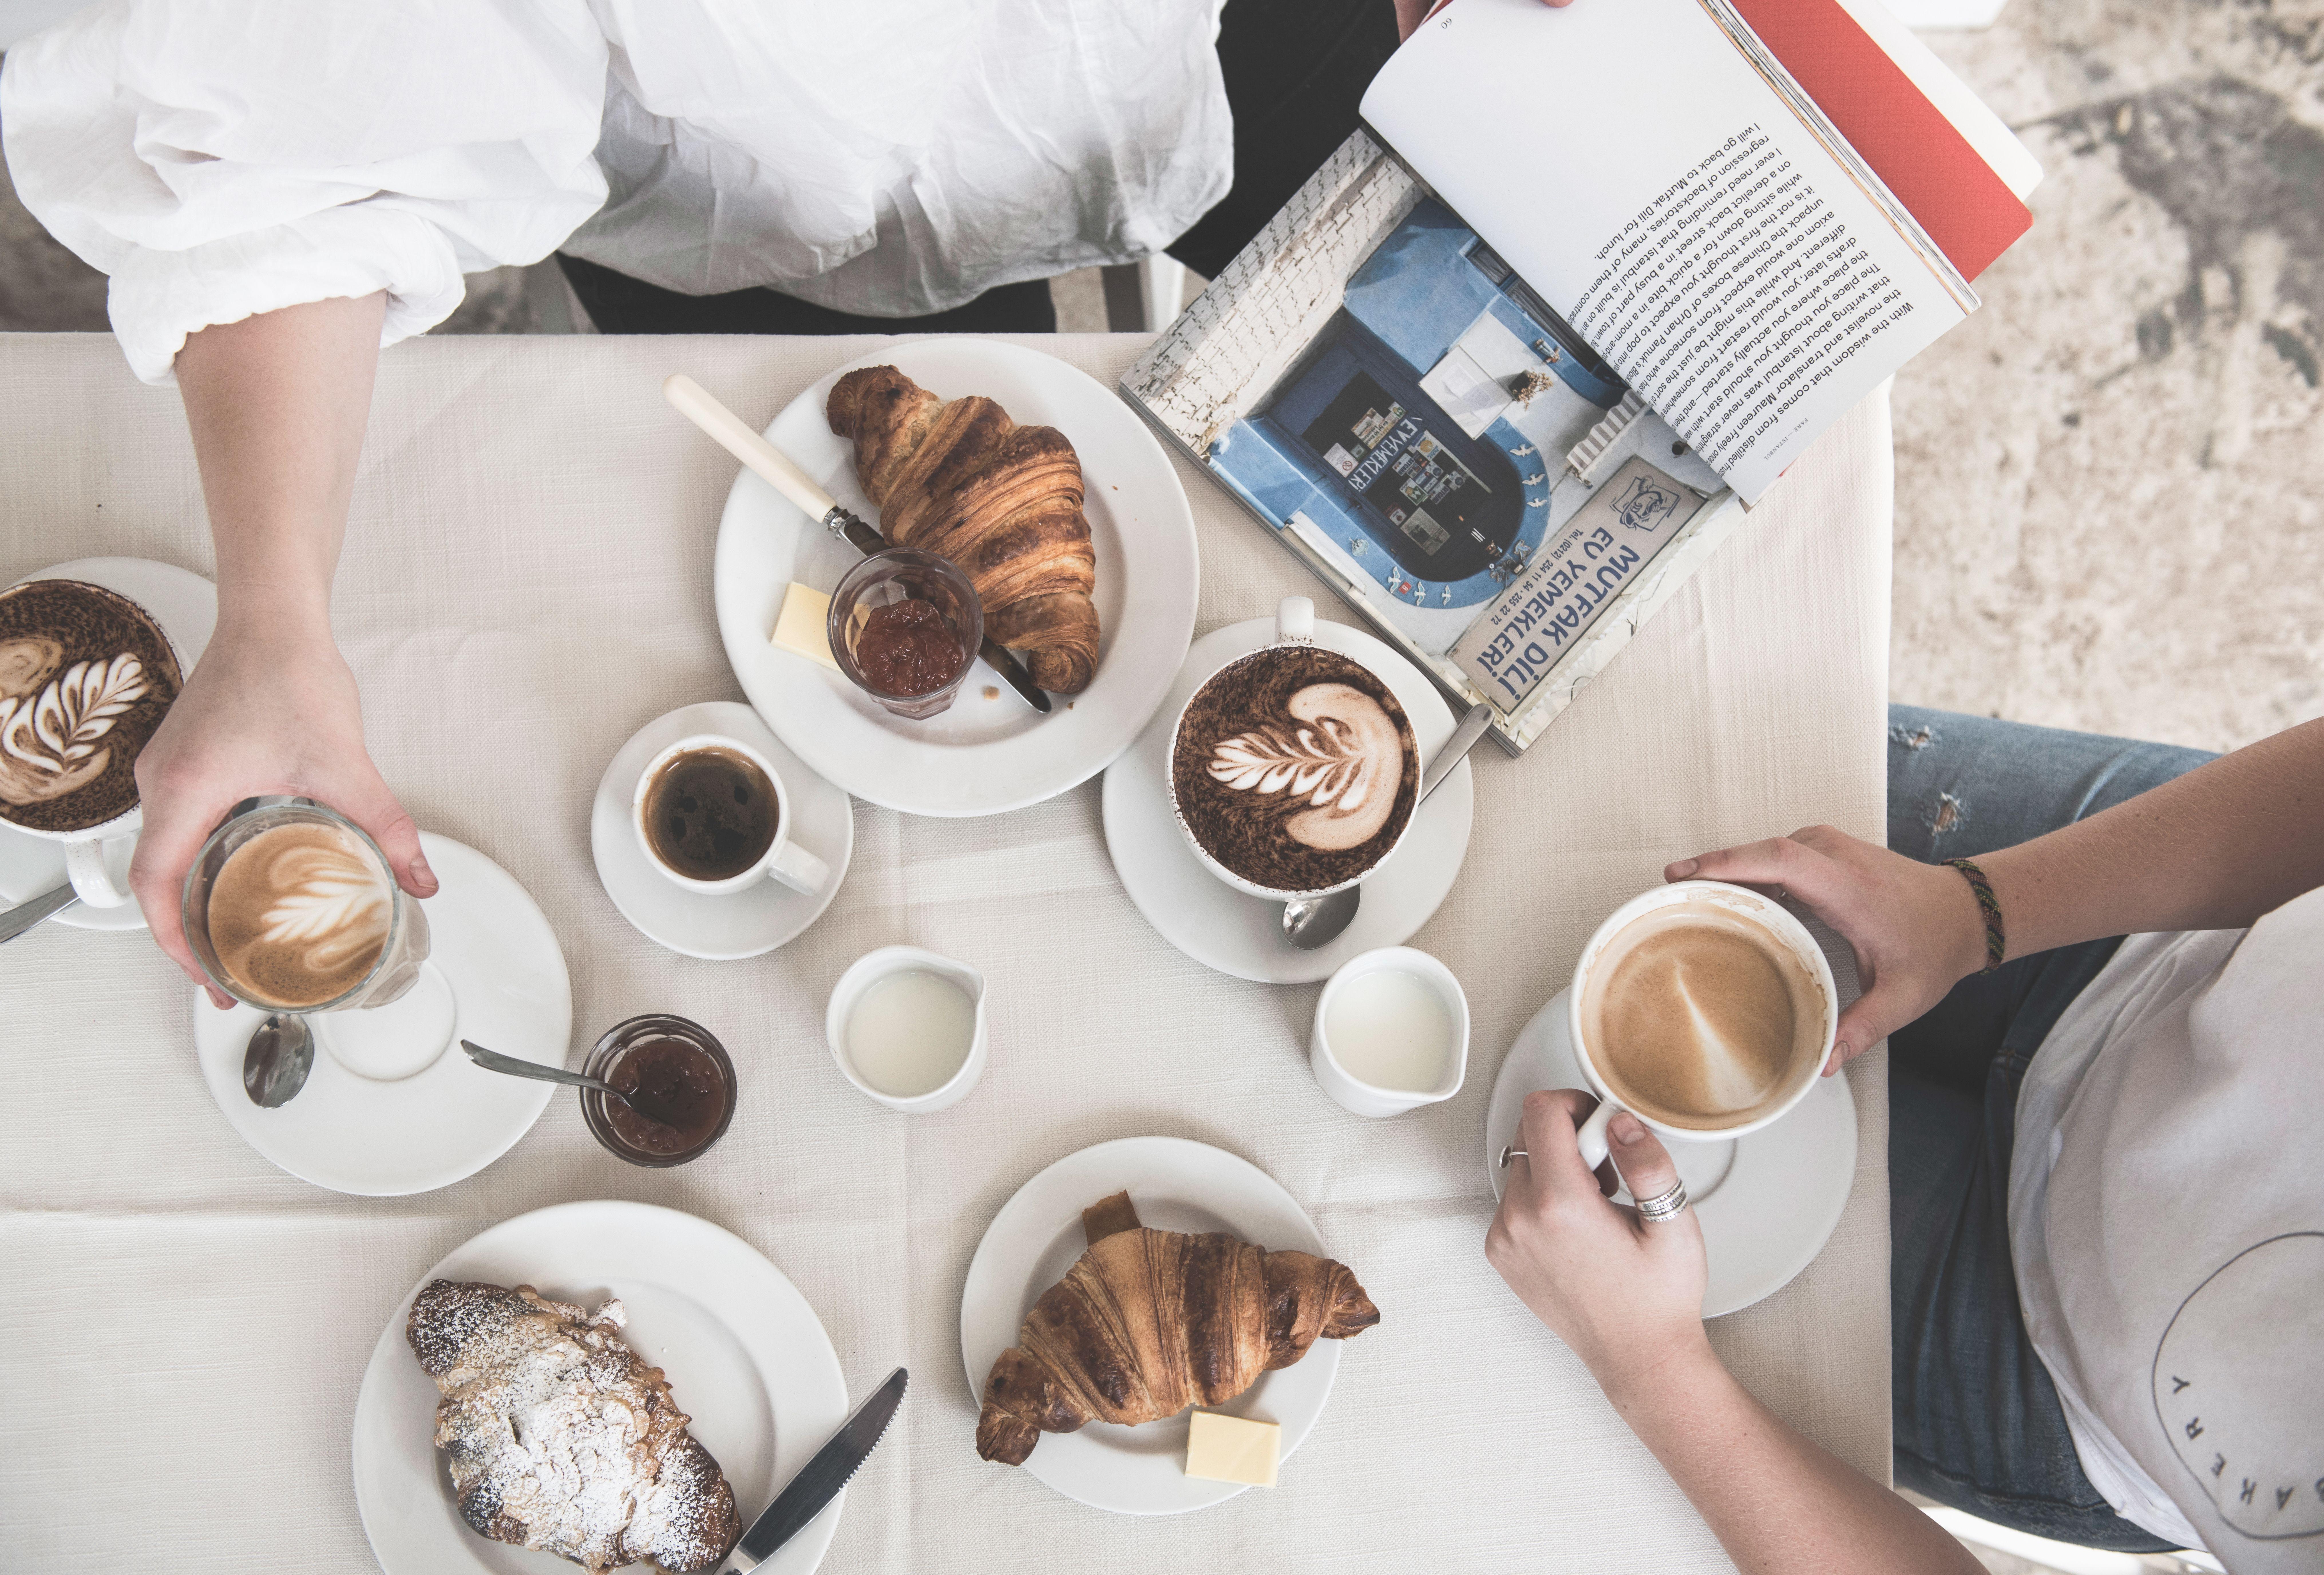 Aran bakery bakery food food and drink